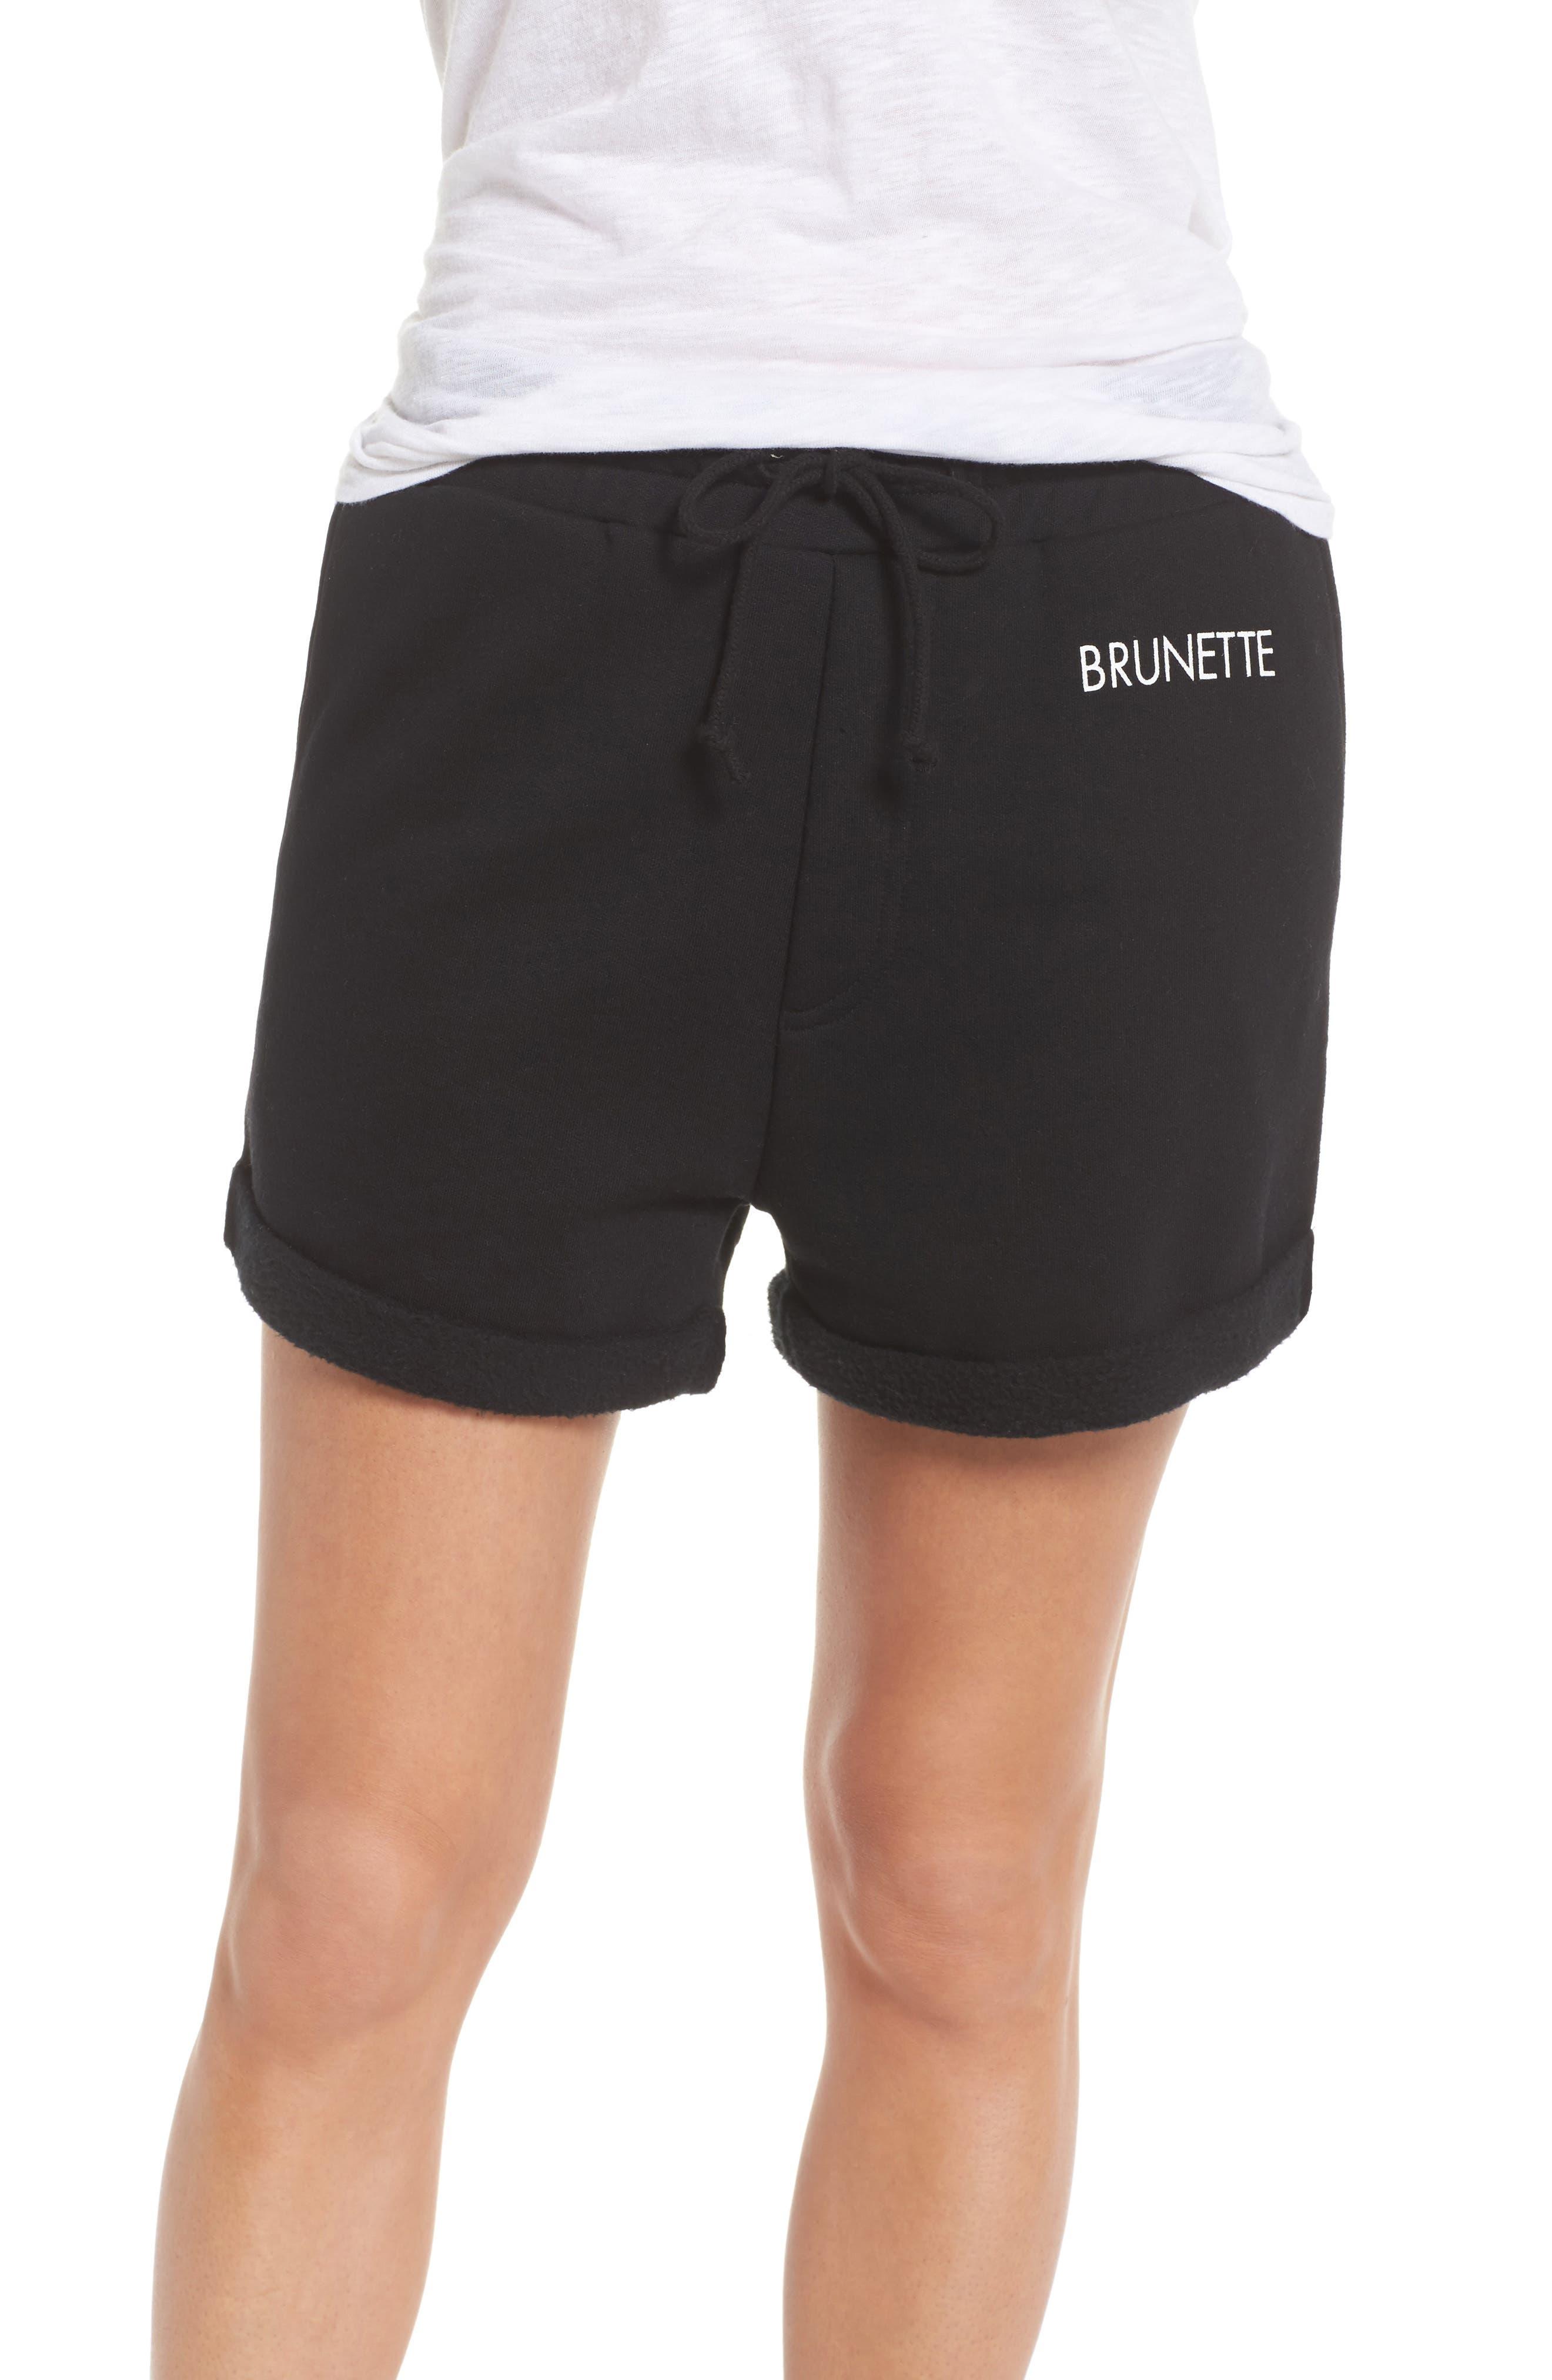 Brunette Shorts,                             Main thumbnail 1, color,                             Black